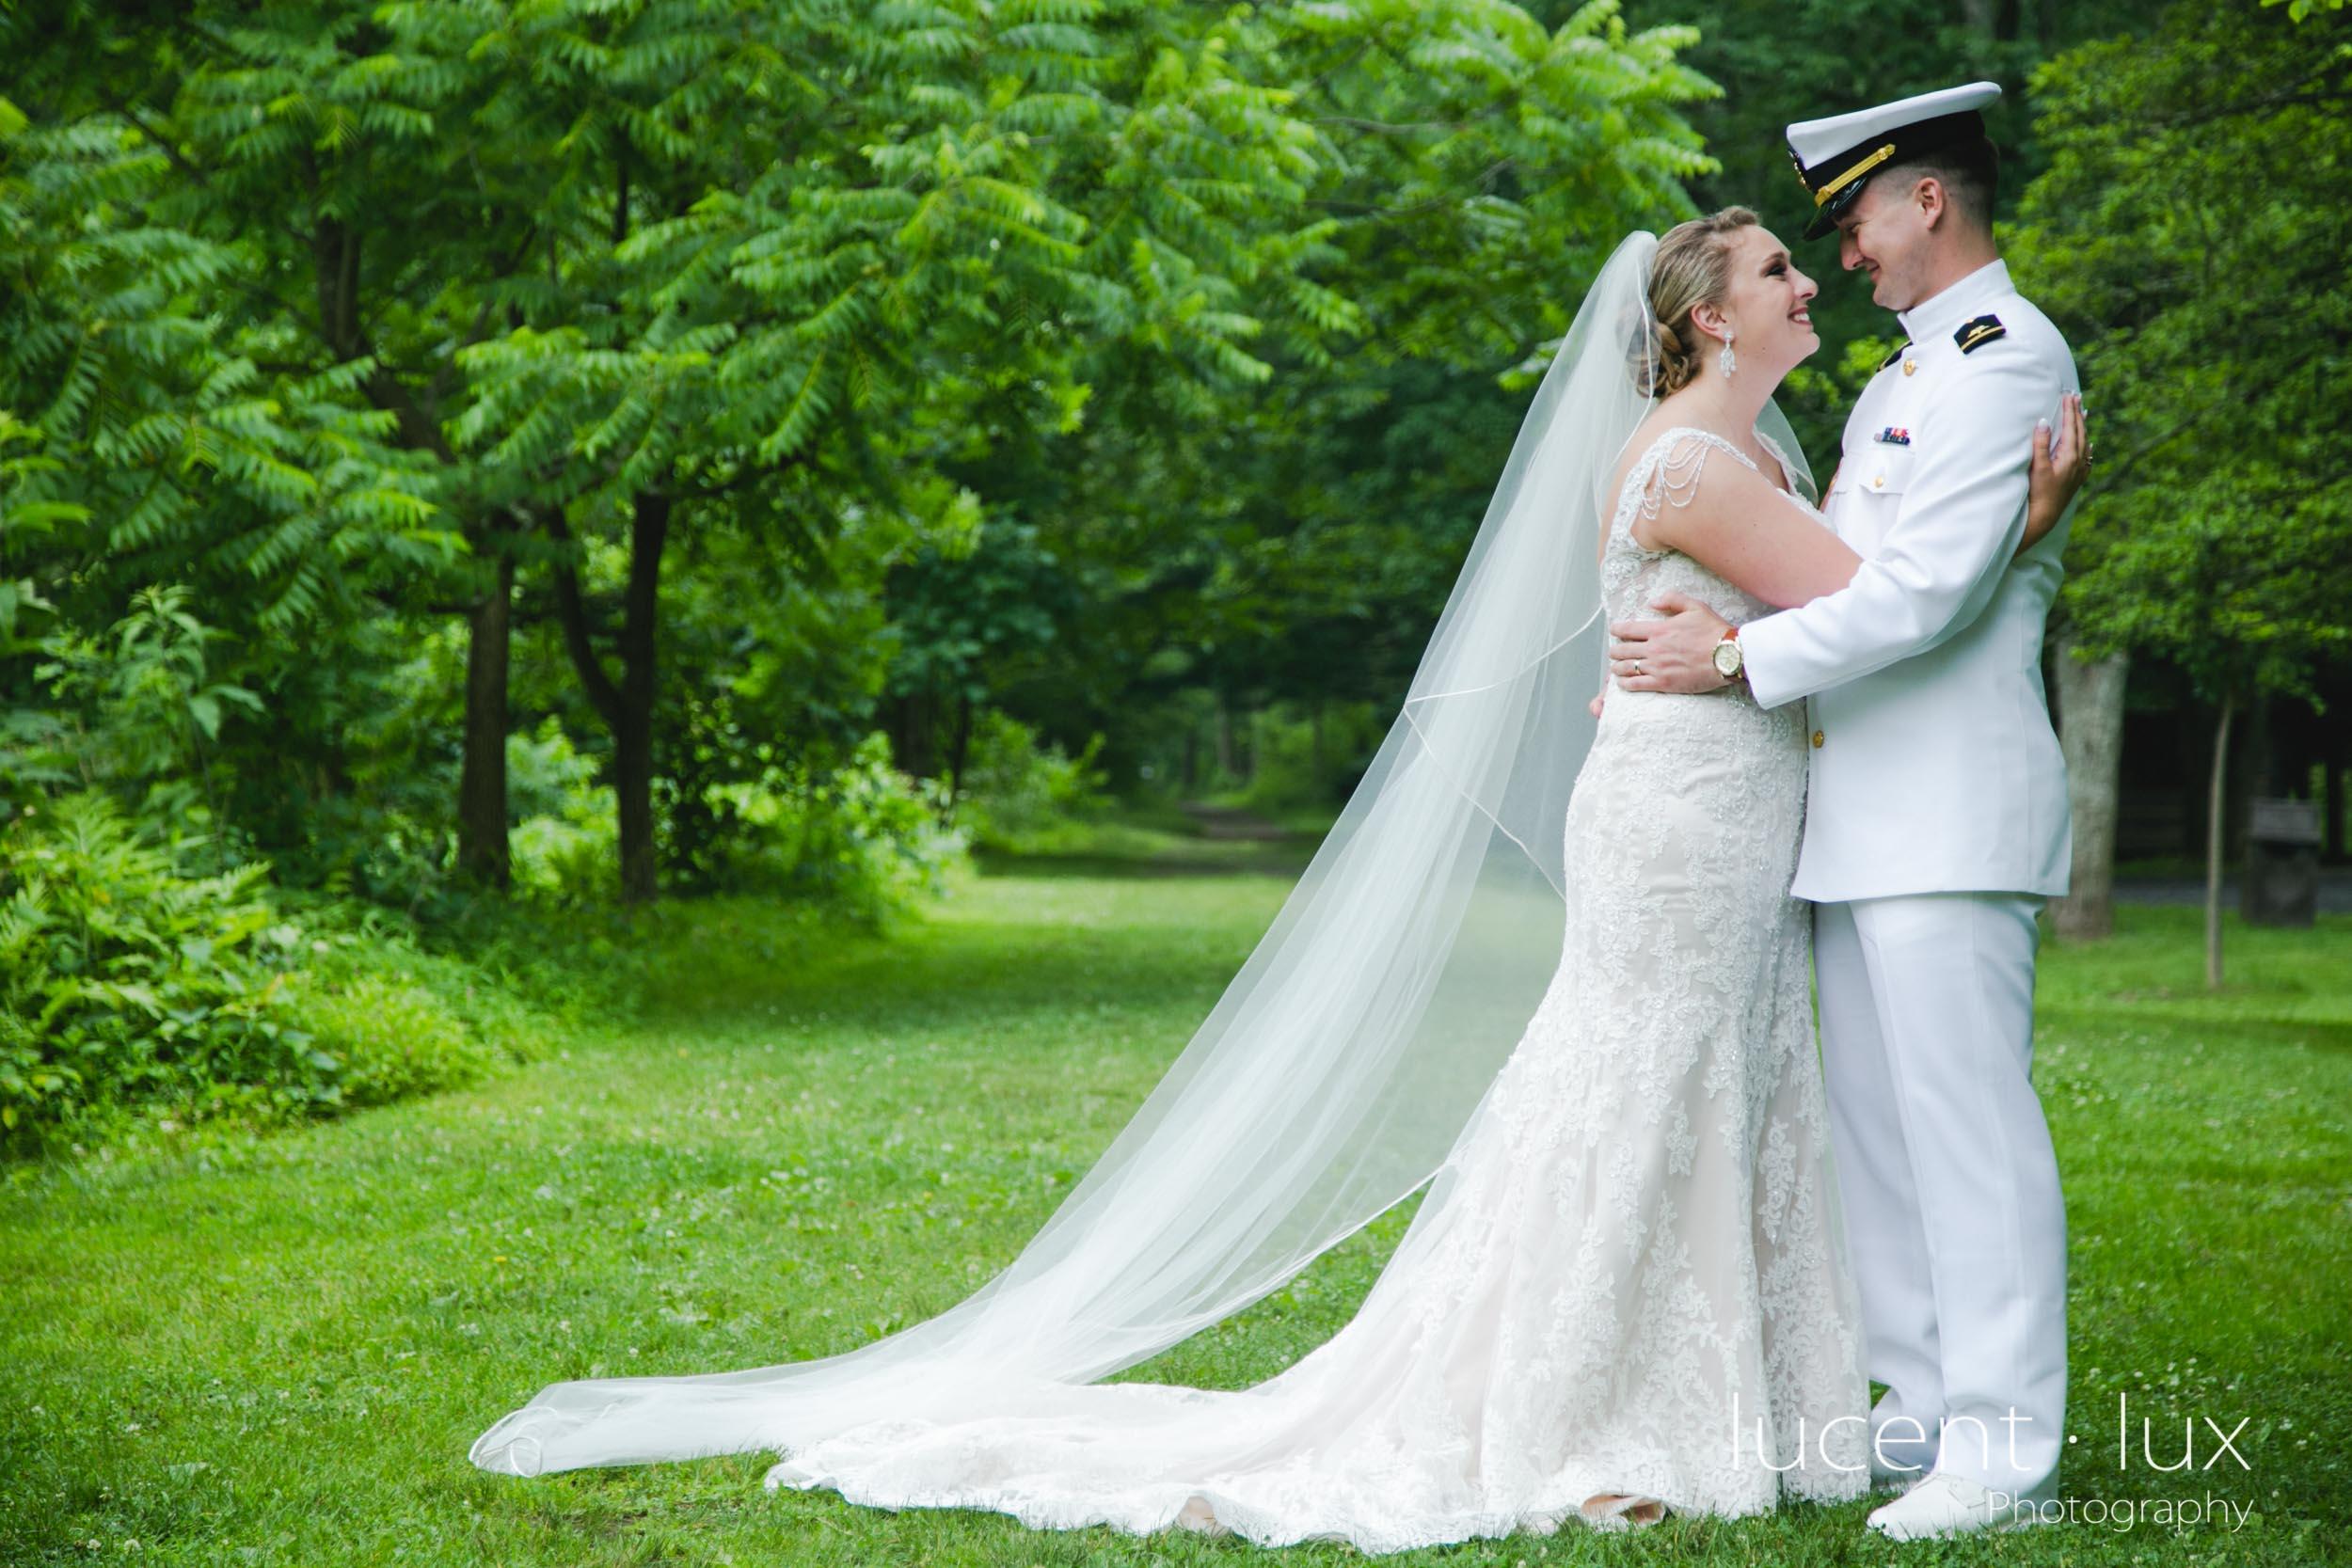 Wedding-Photography-Maryland-Pennsylvania-Photographer-Mendenhall-Inn-Media-Portrait-Event-132.jpg